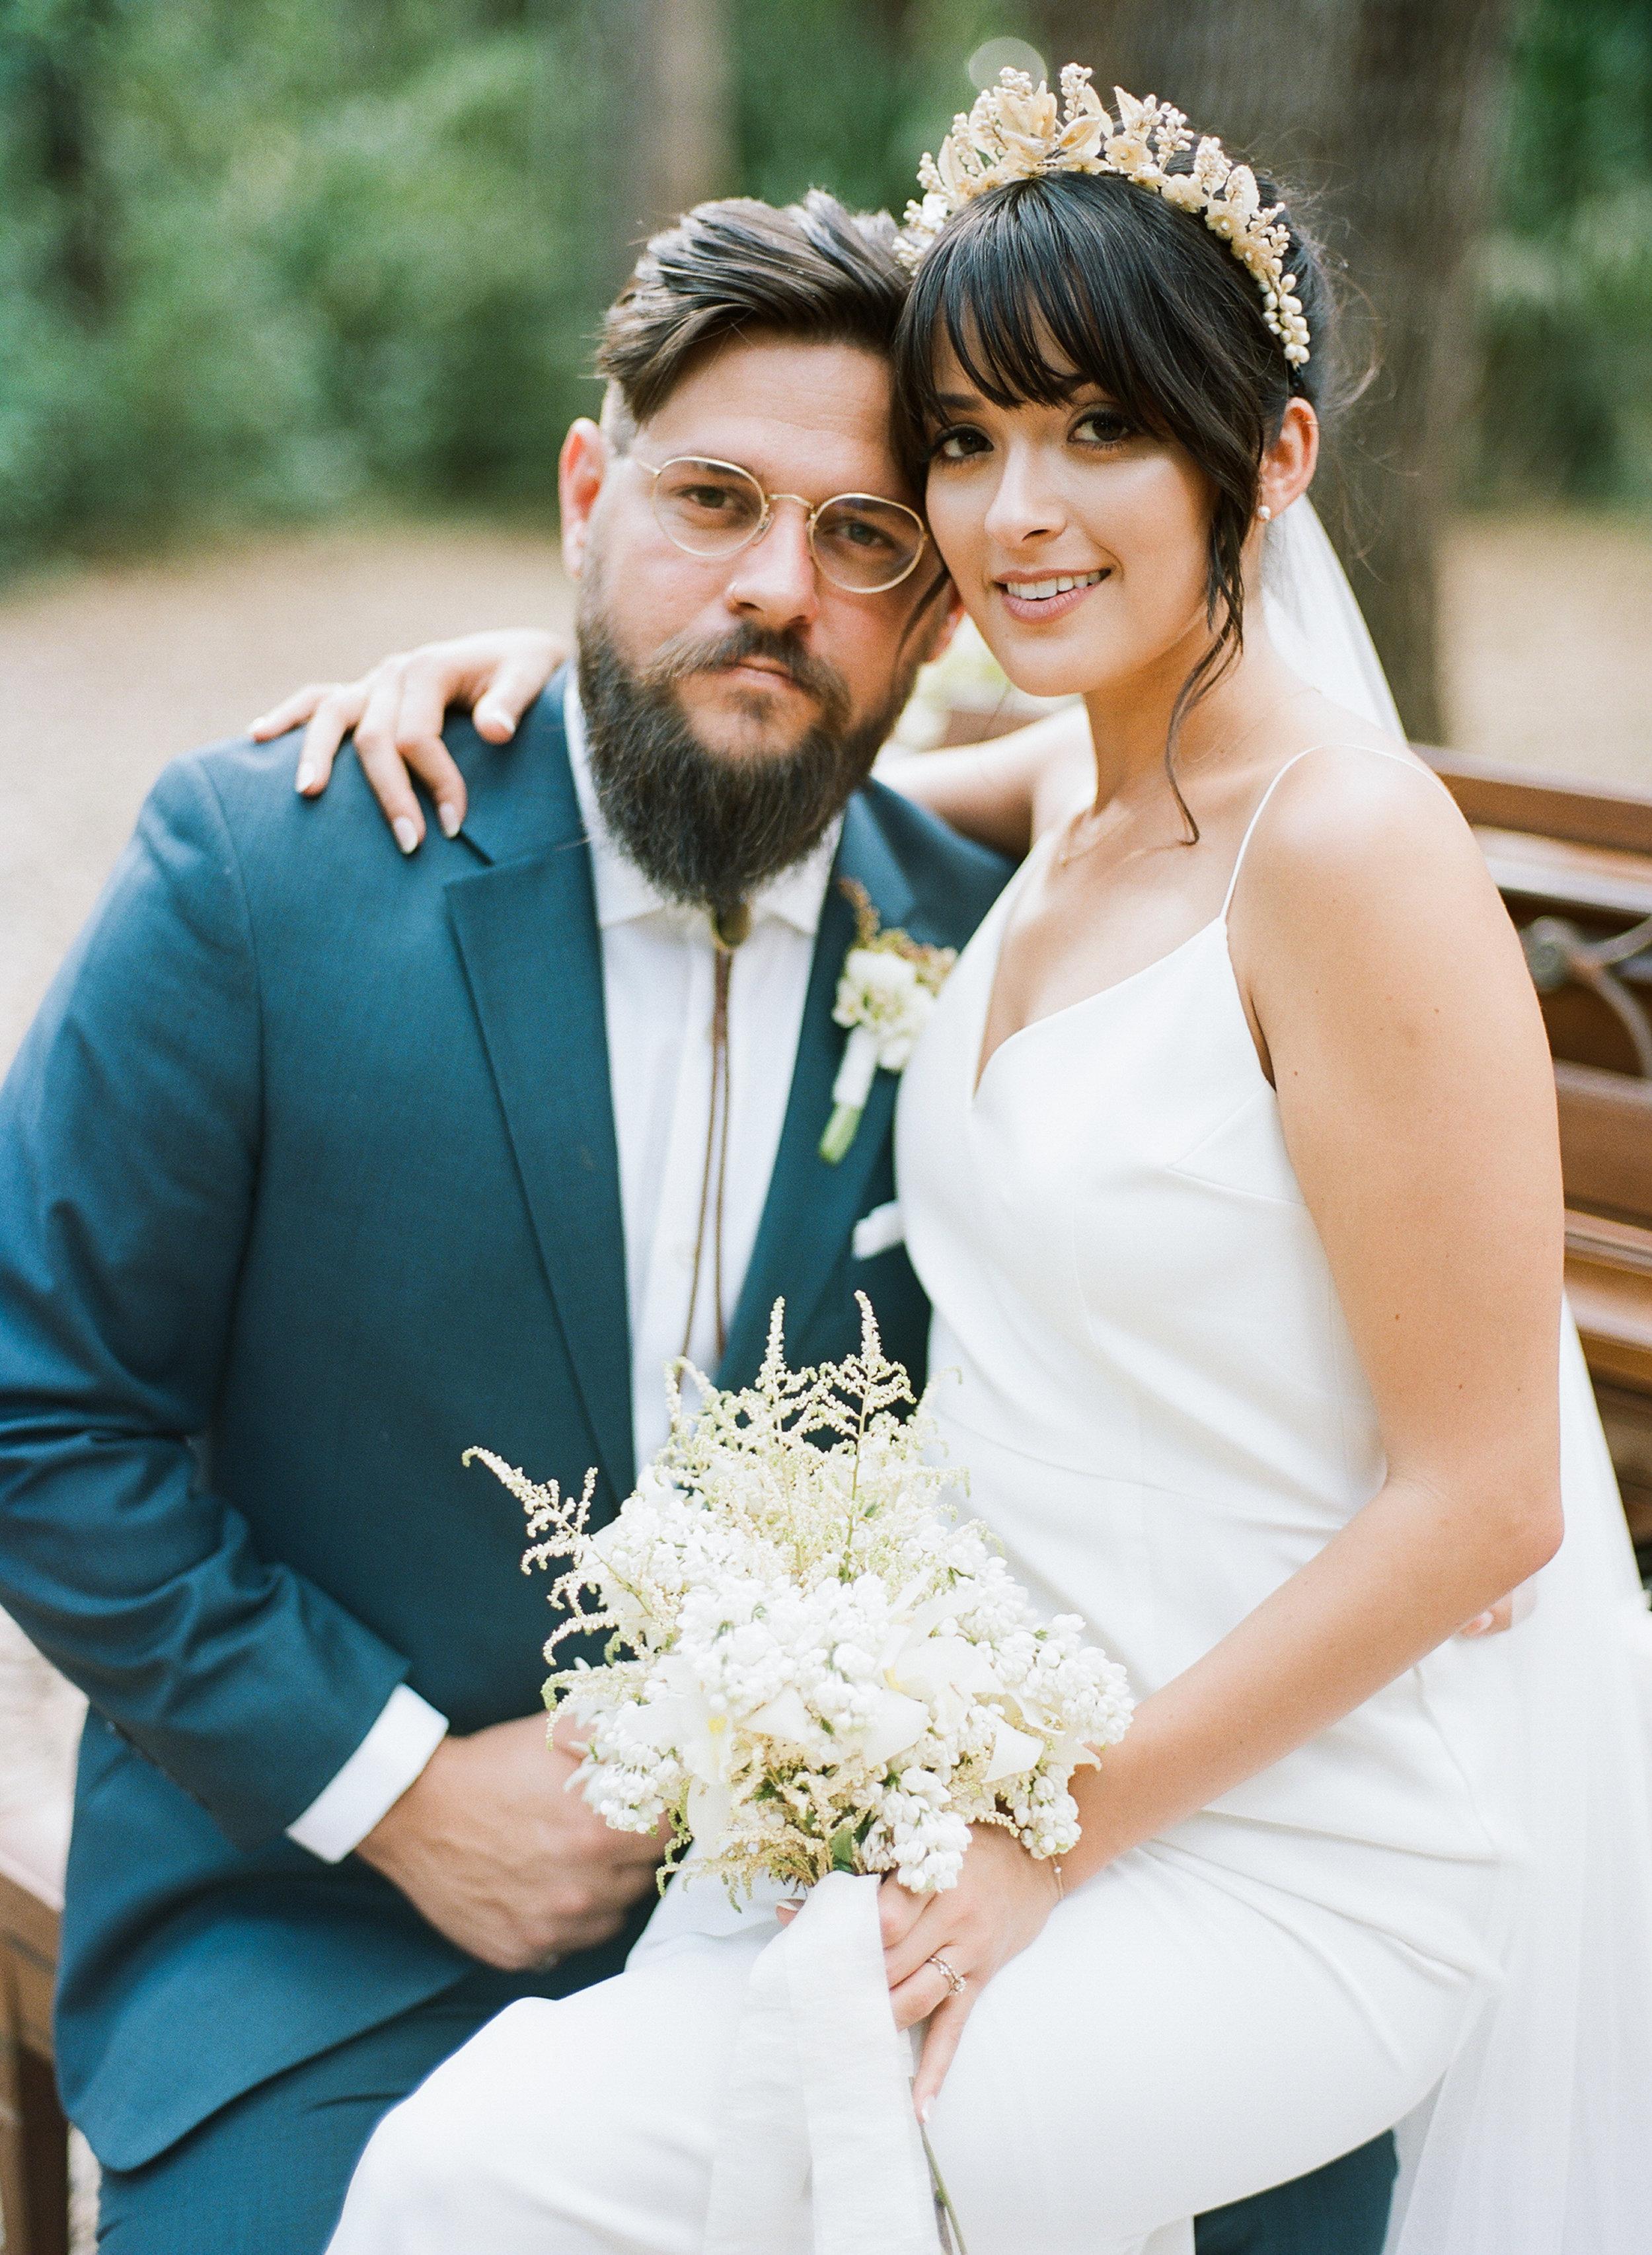 39-erika-delgado-wedding-to-josh-diaz.jpg